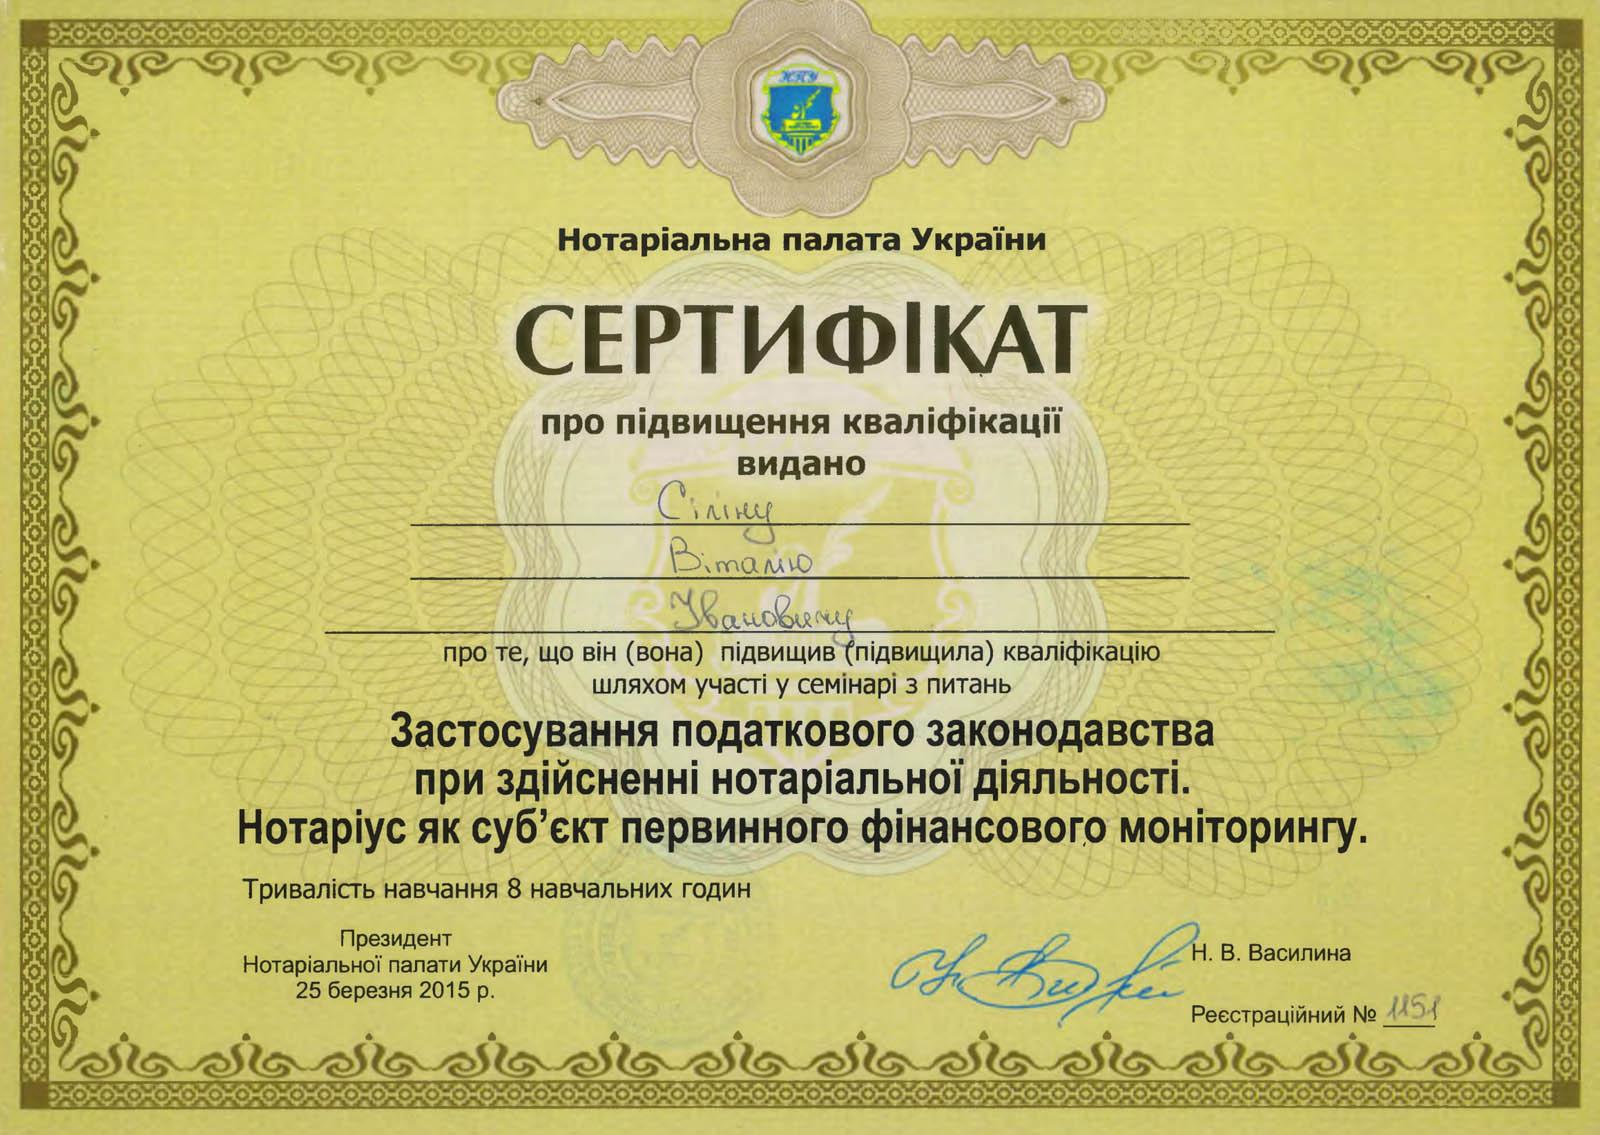 сертификат Силин1